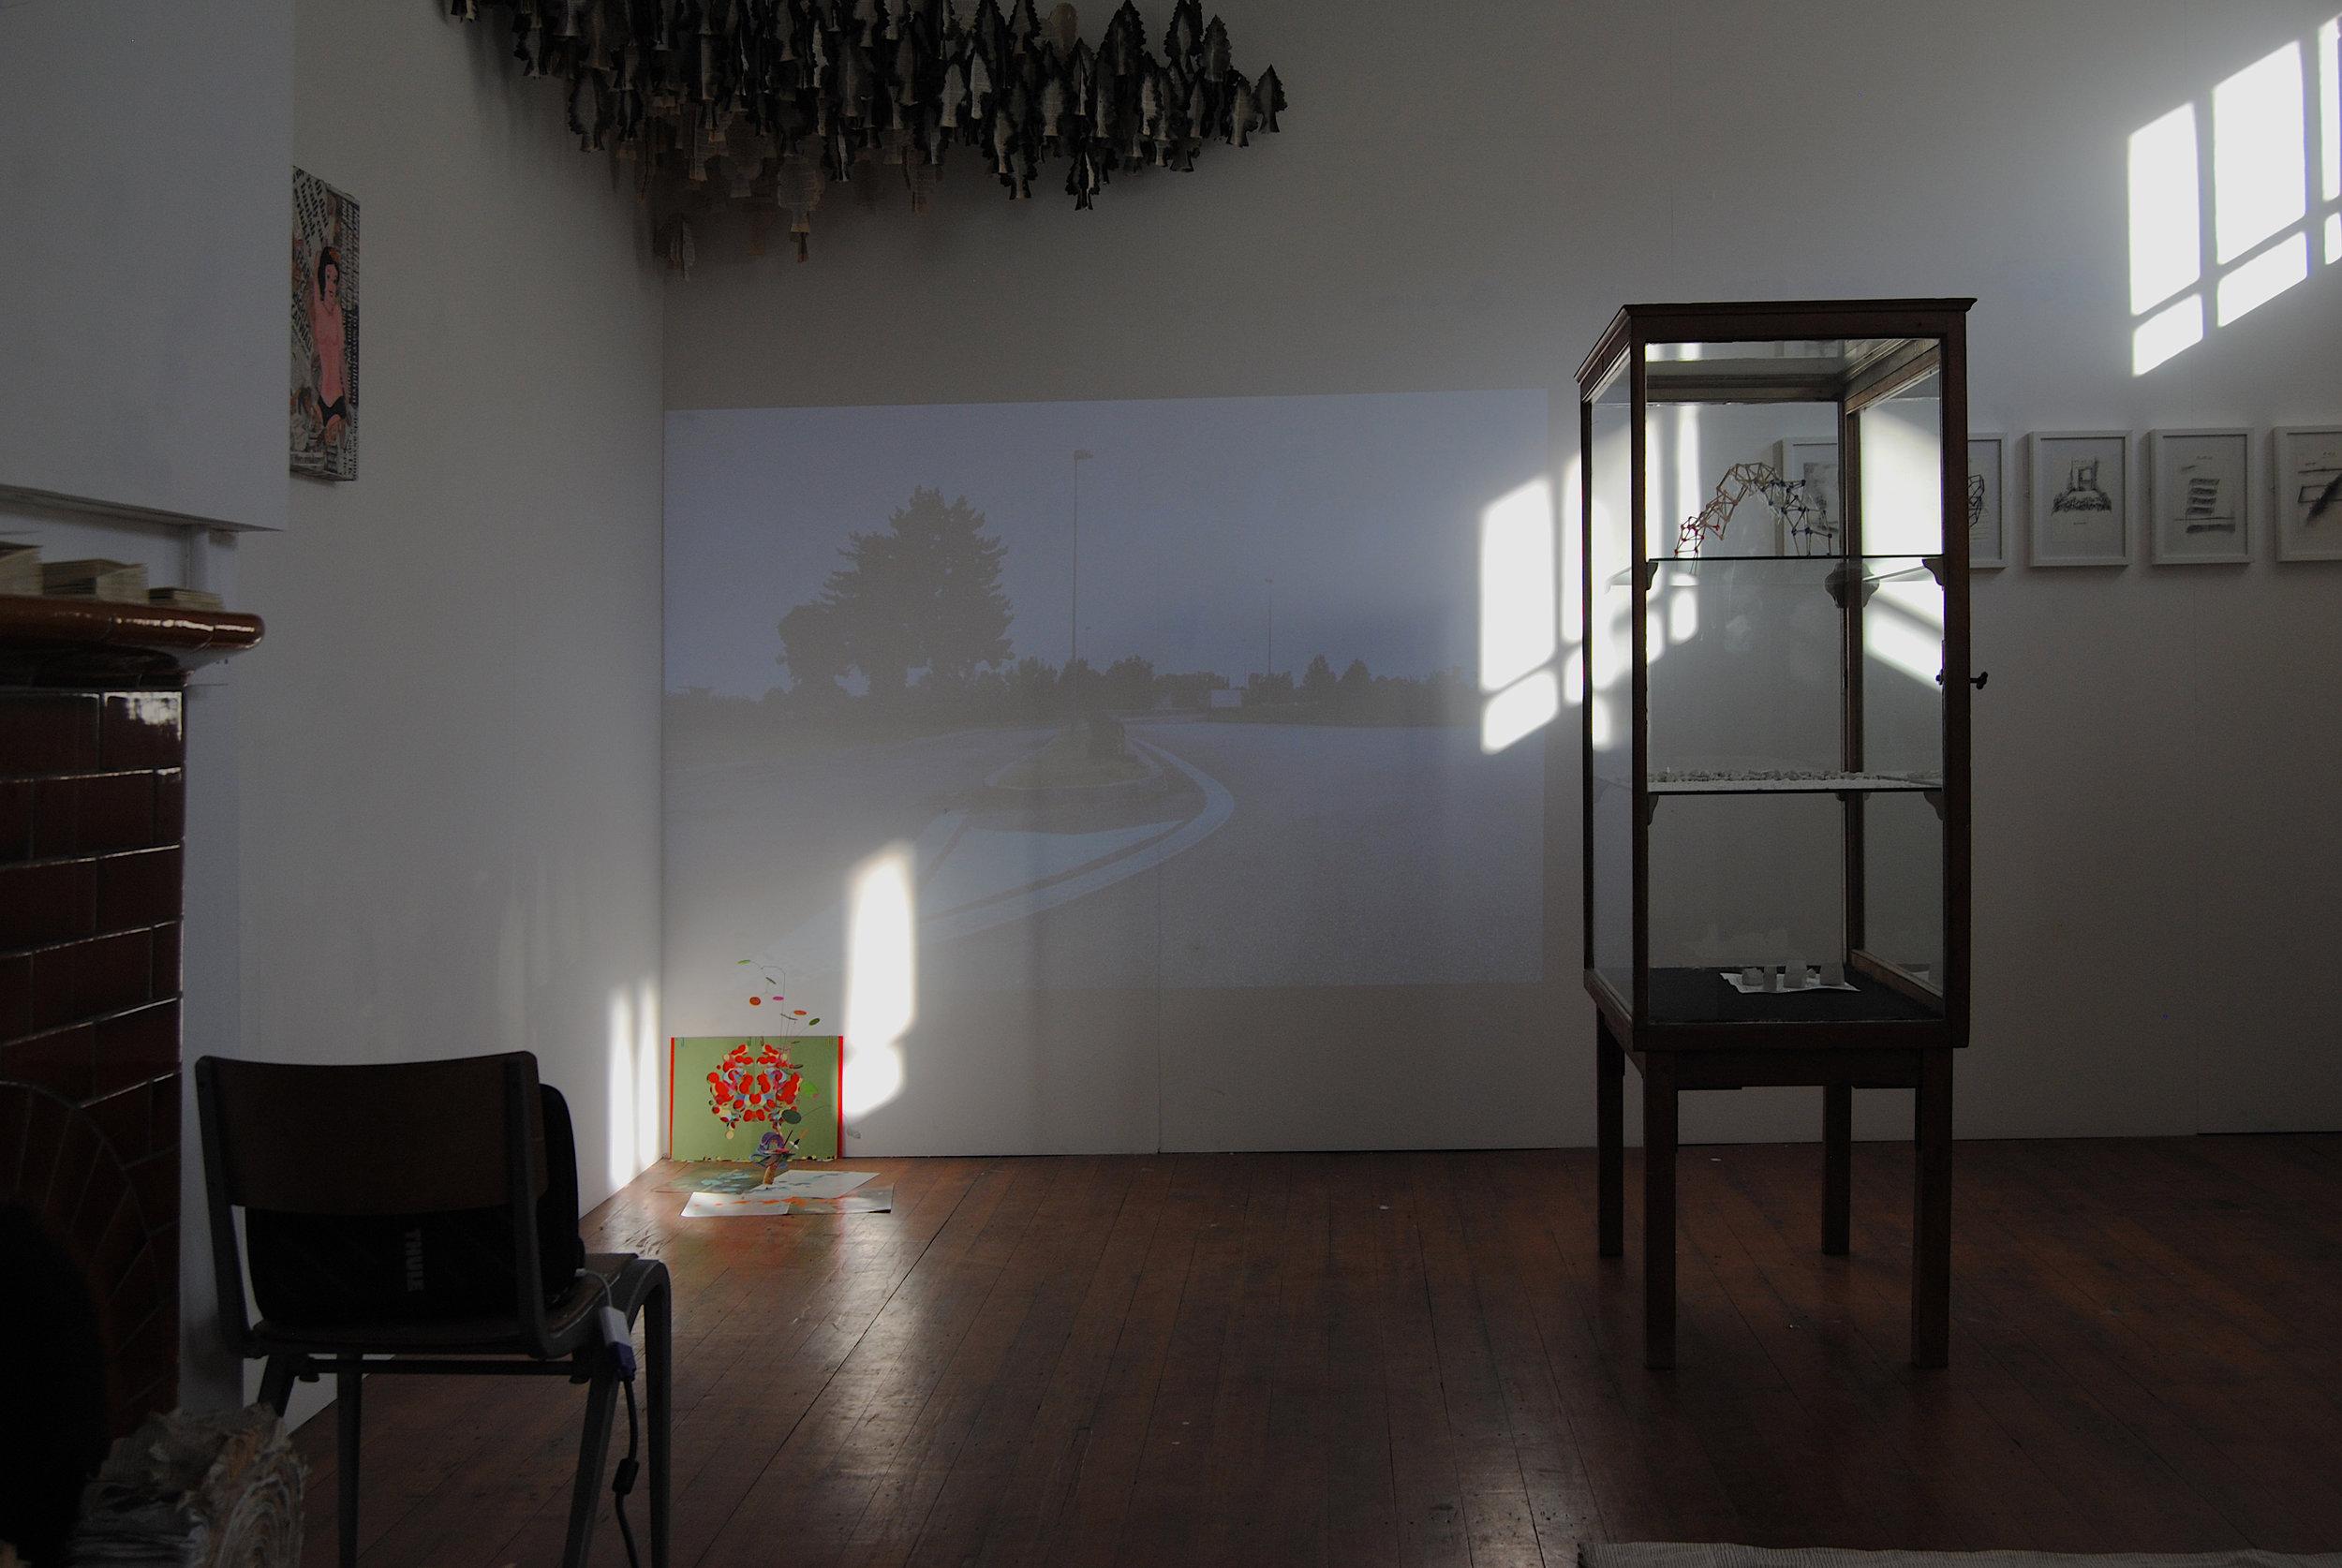 INHOSPITABLE | Liverpool Biennial | October 2012